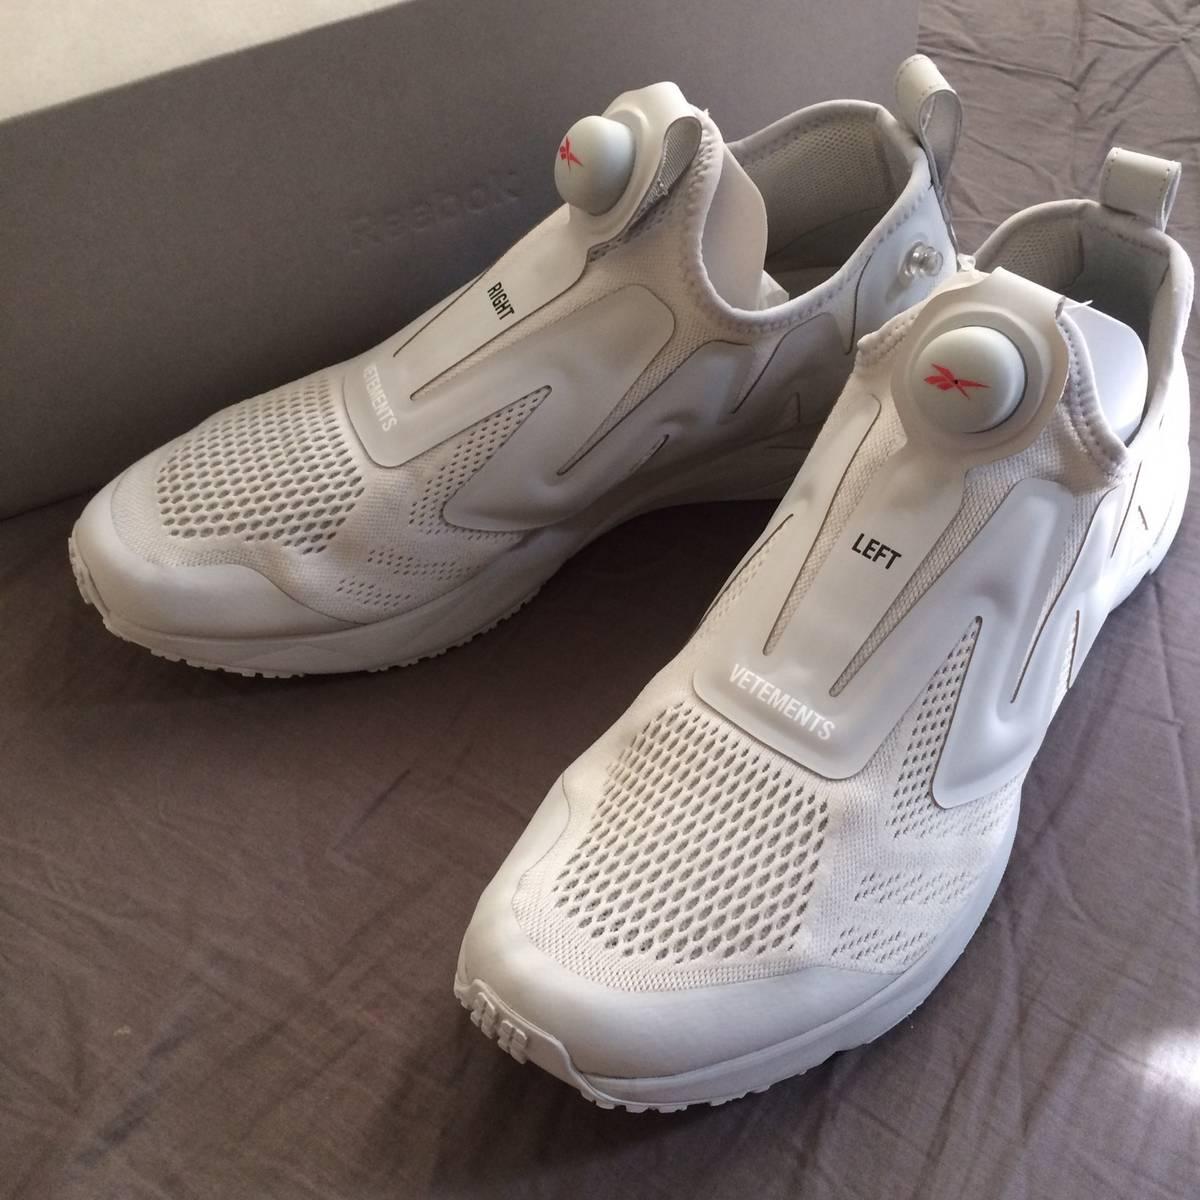 Vetements Vetements x Reebok Pump Supreme DSM Exclusive (Grey) Size 11.5 -  Low-Top Sneakers for Sale - Grailed 20c66375262b